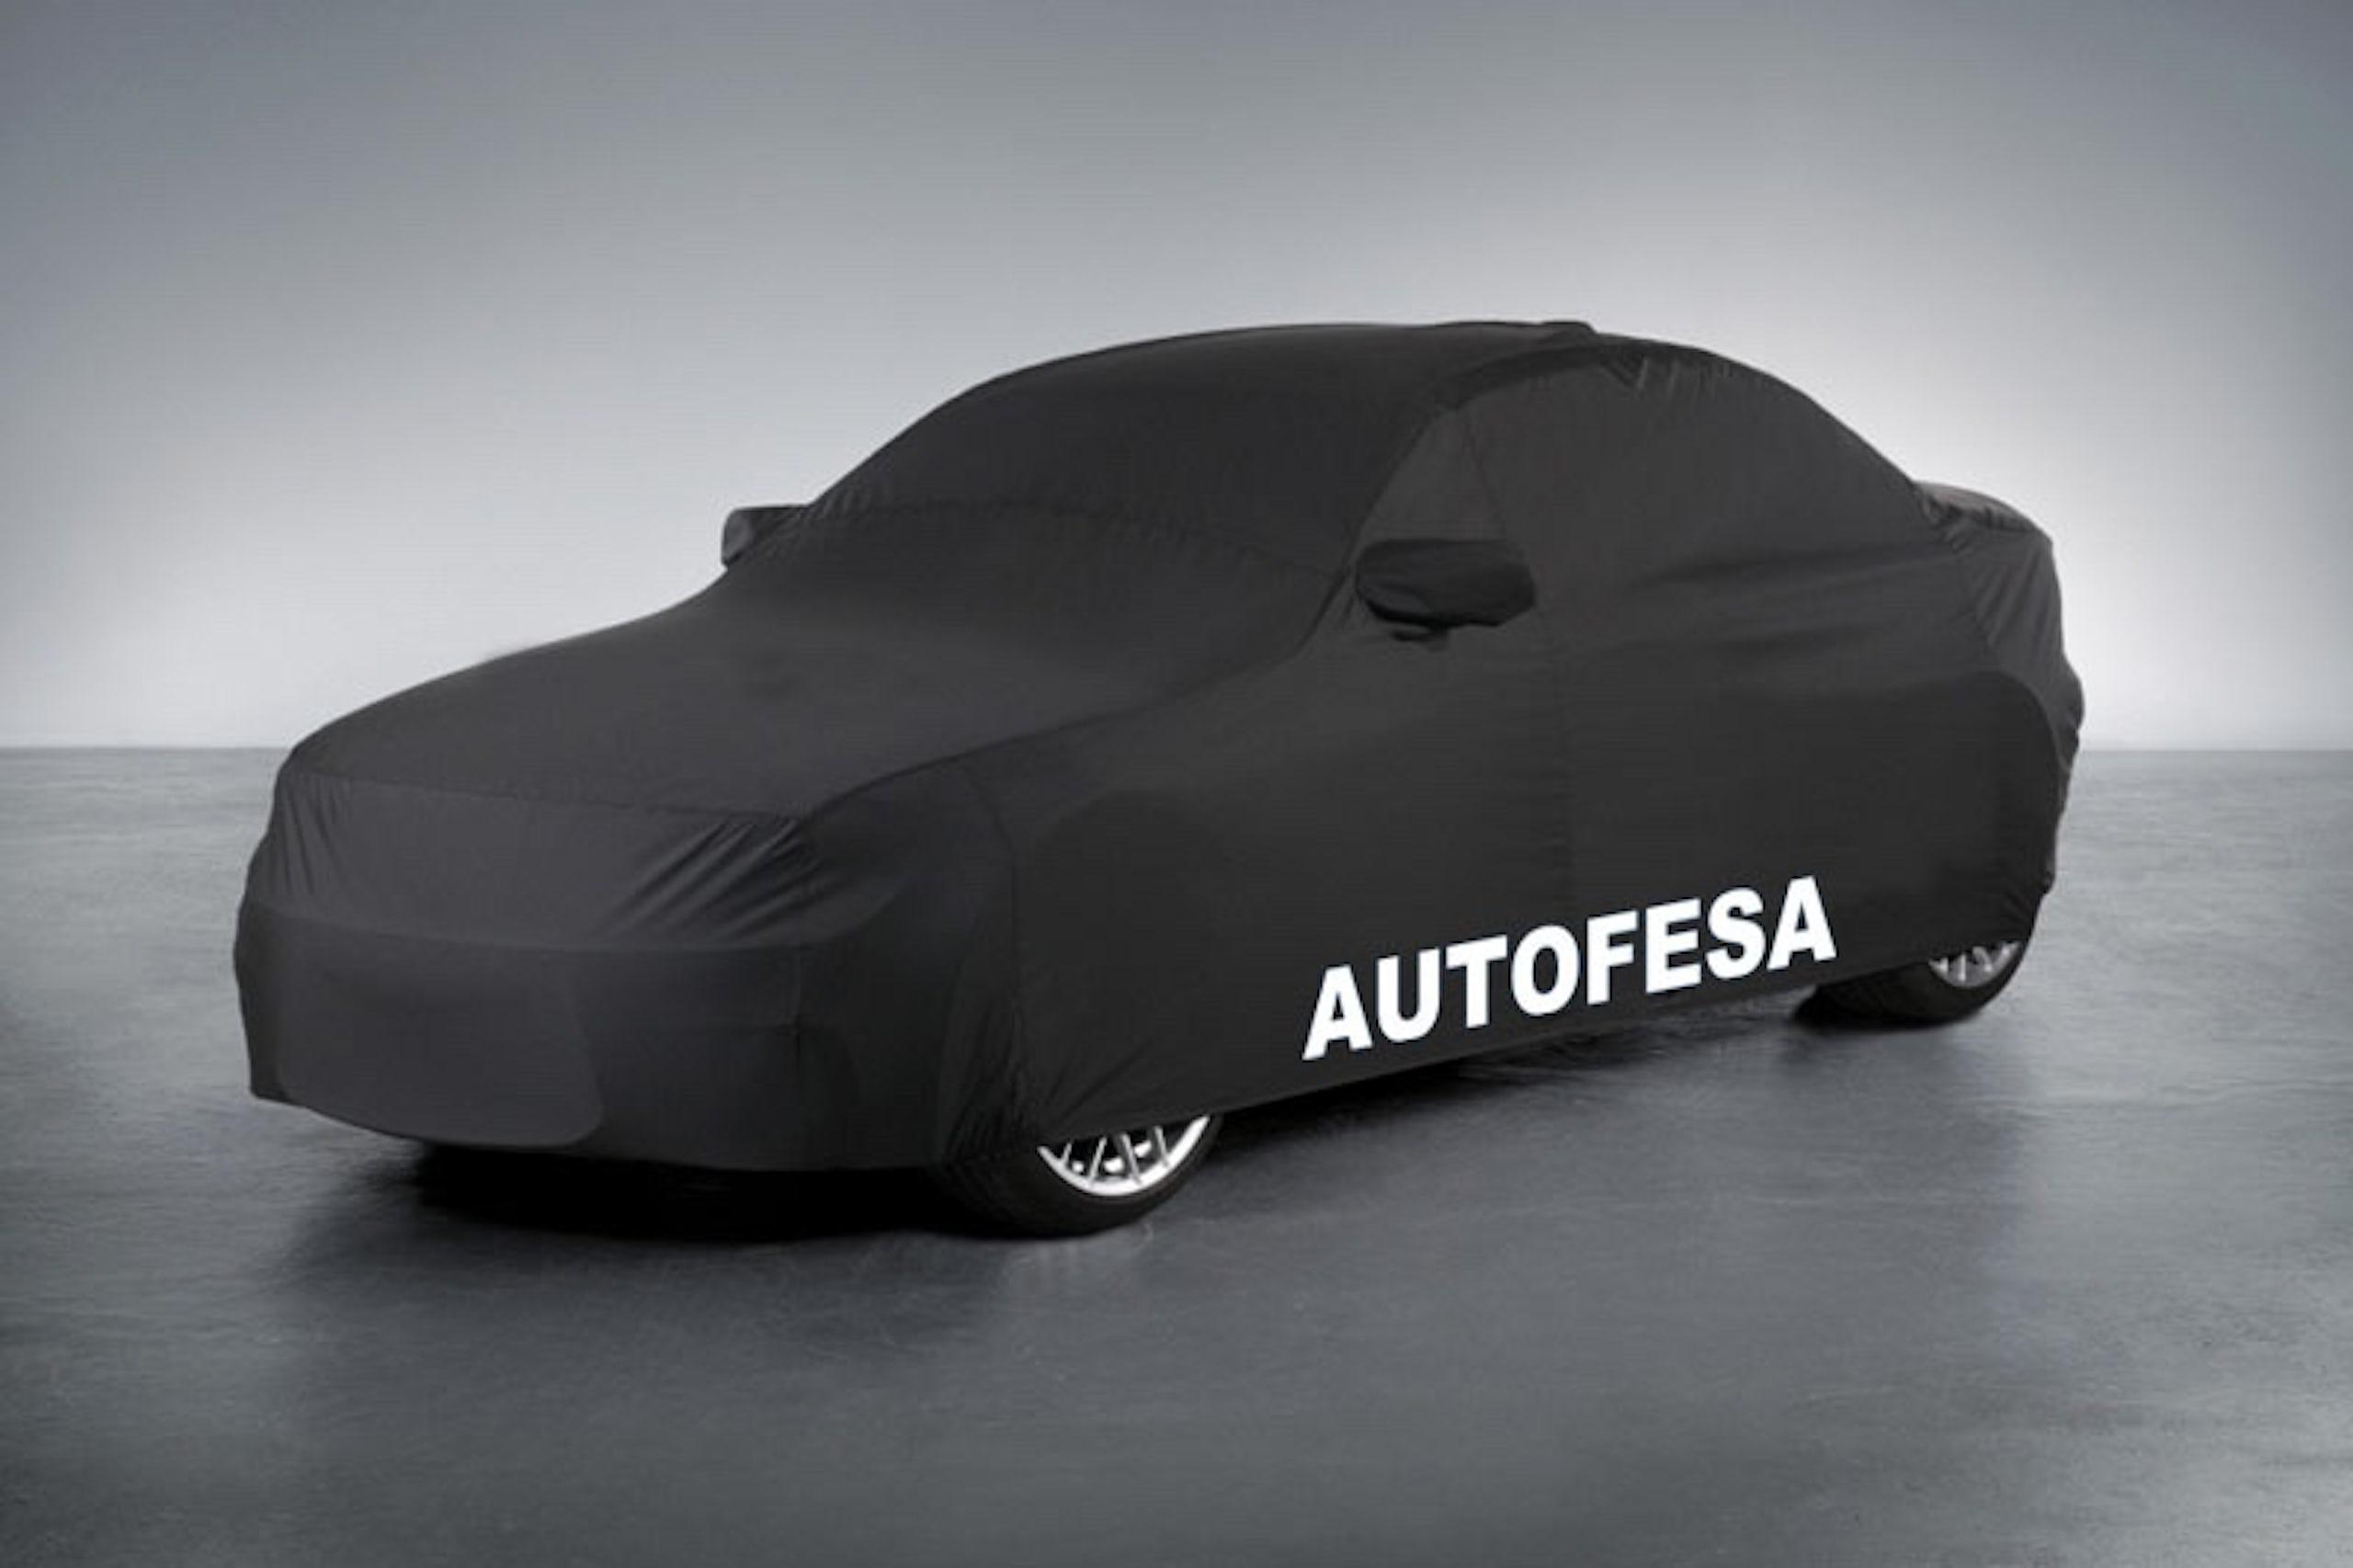 Audi Q5 2.0 TDI 170cv quattro 5p S tronic Auto - Foto 1